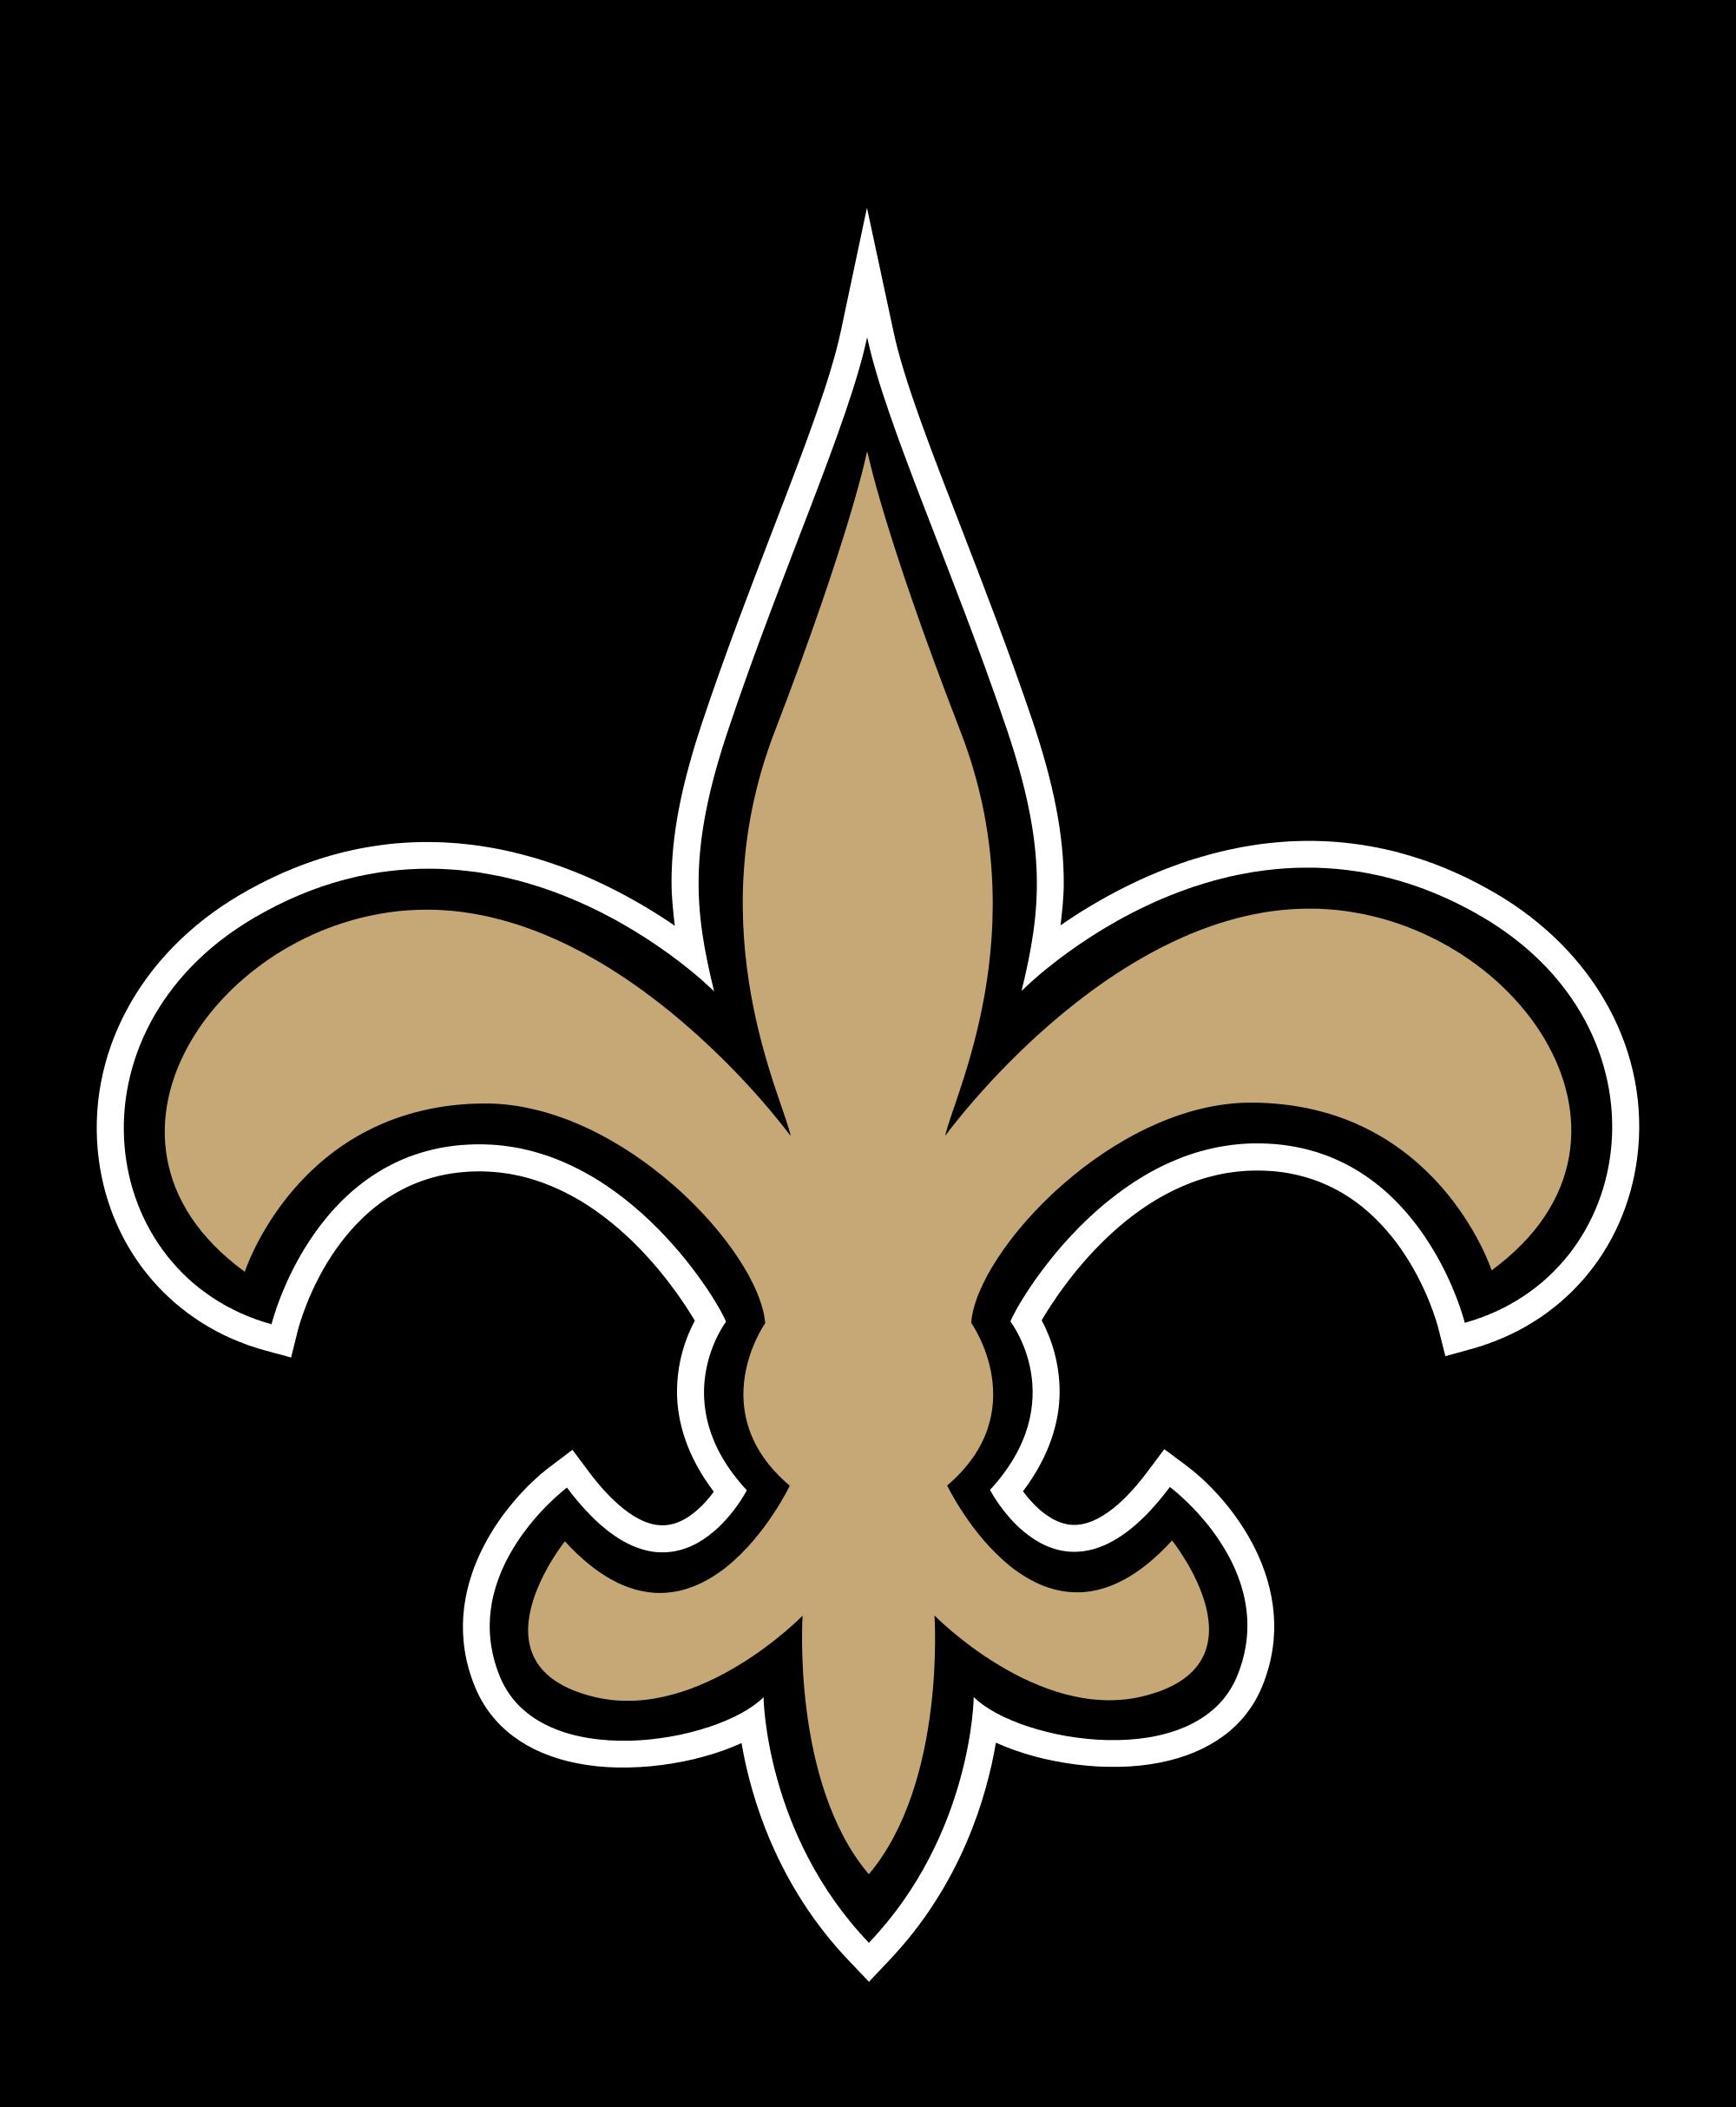 New Orleans Saints Football Team Logo New Orleans Saints Logo Saints Football New Orleans Saints